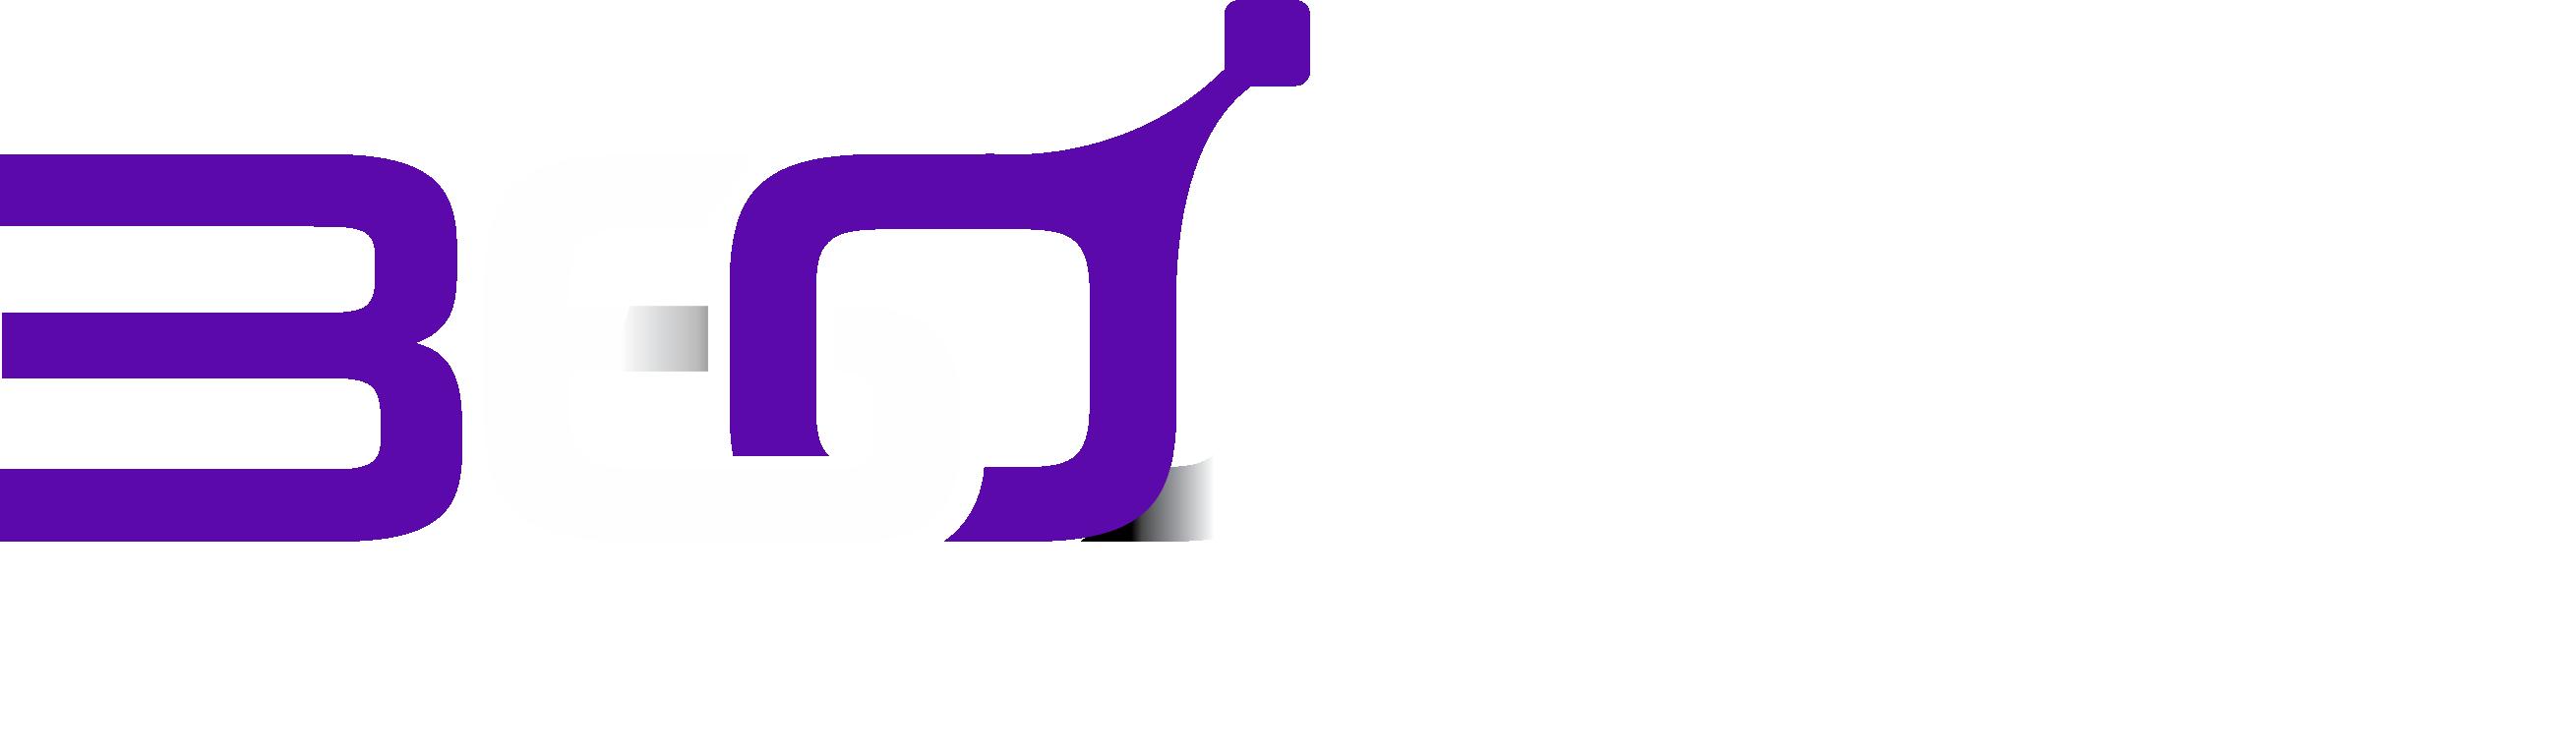 360walk